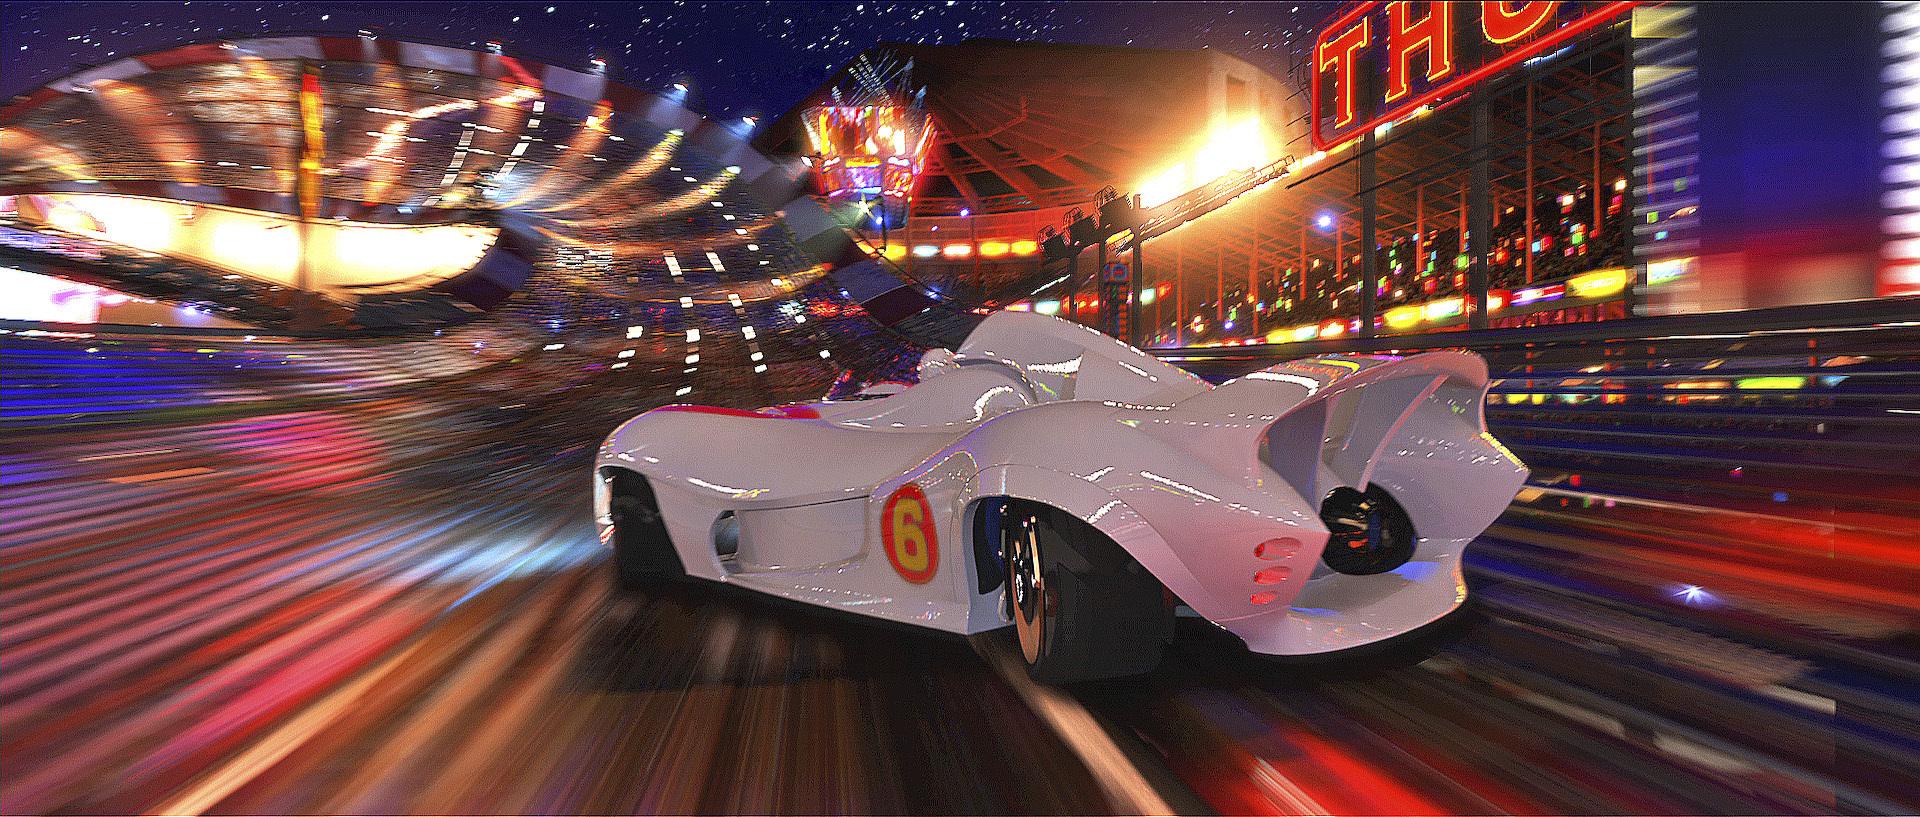 12. Speed Racer